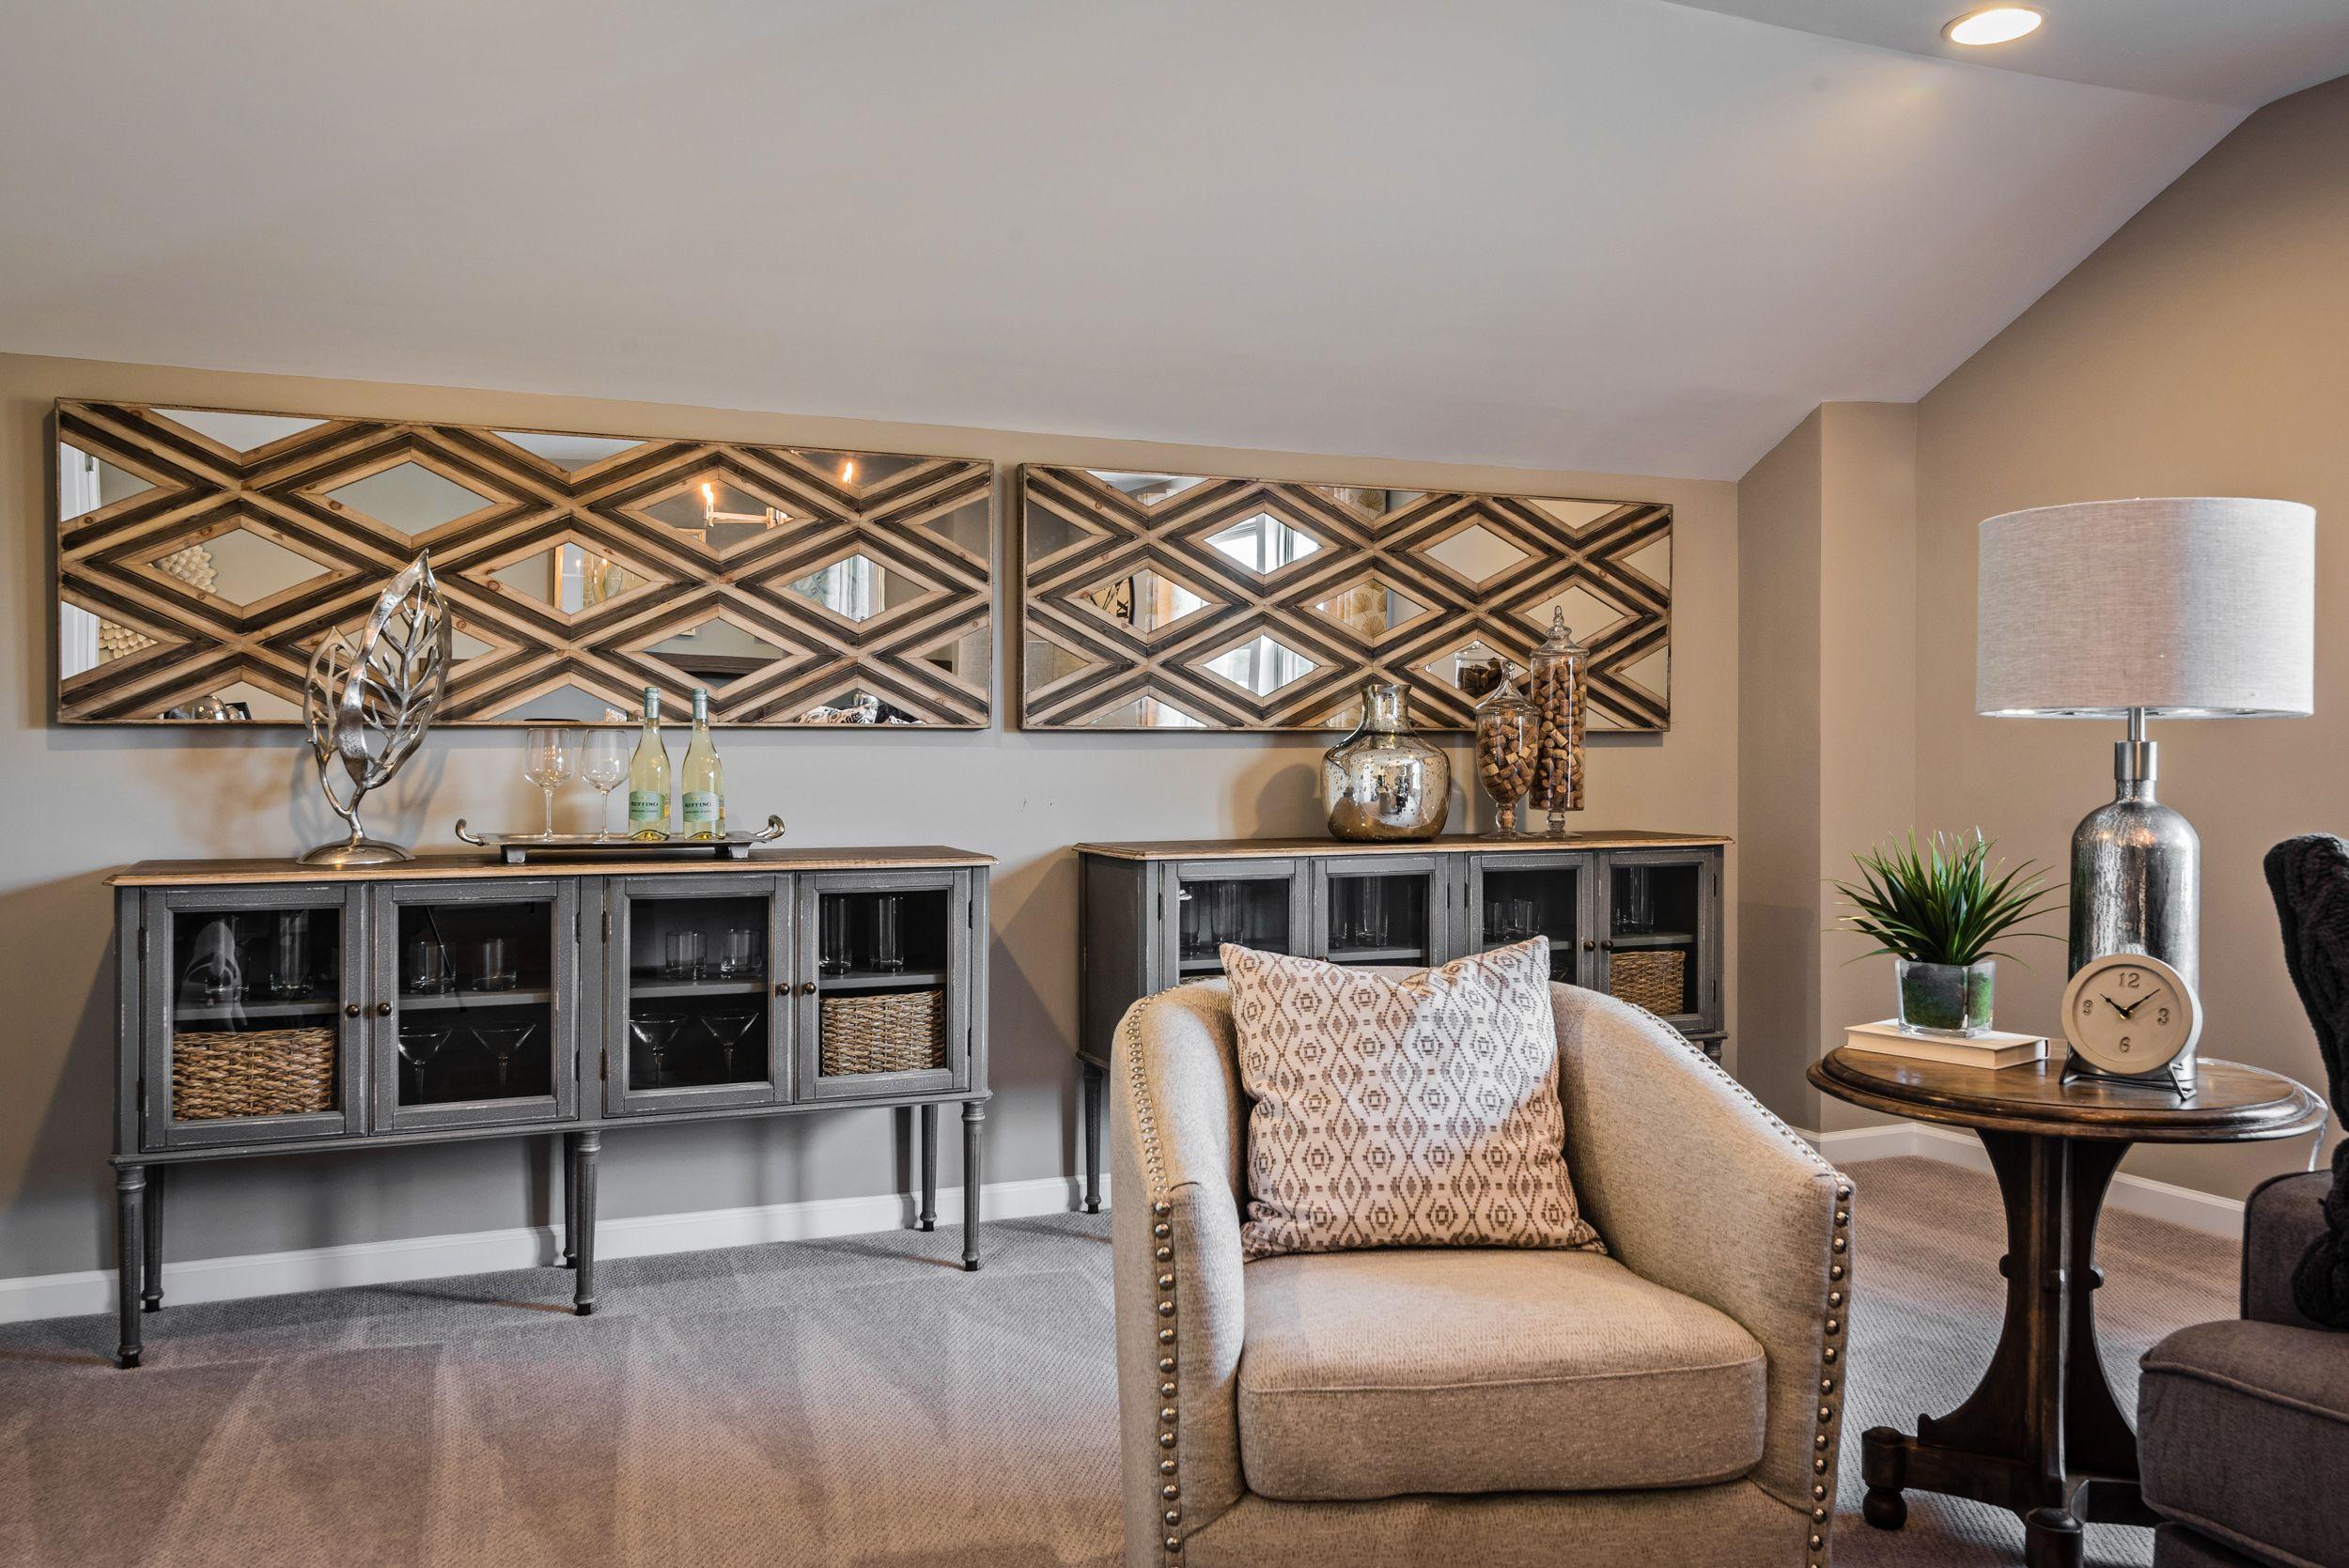 Details in designninteriordesign southernhomes